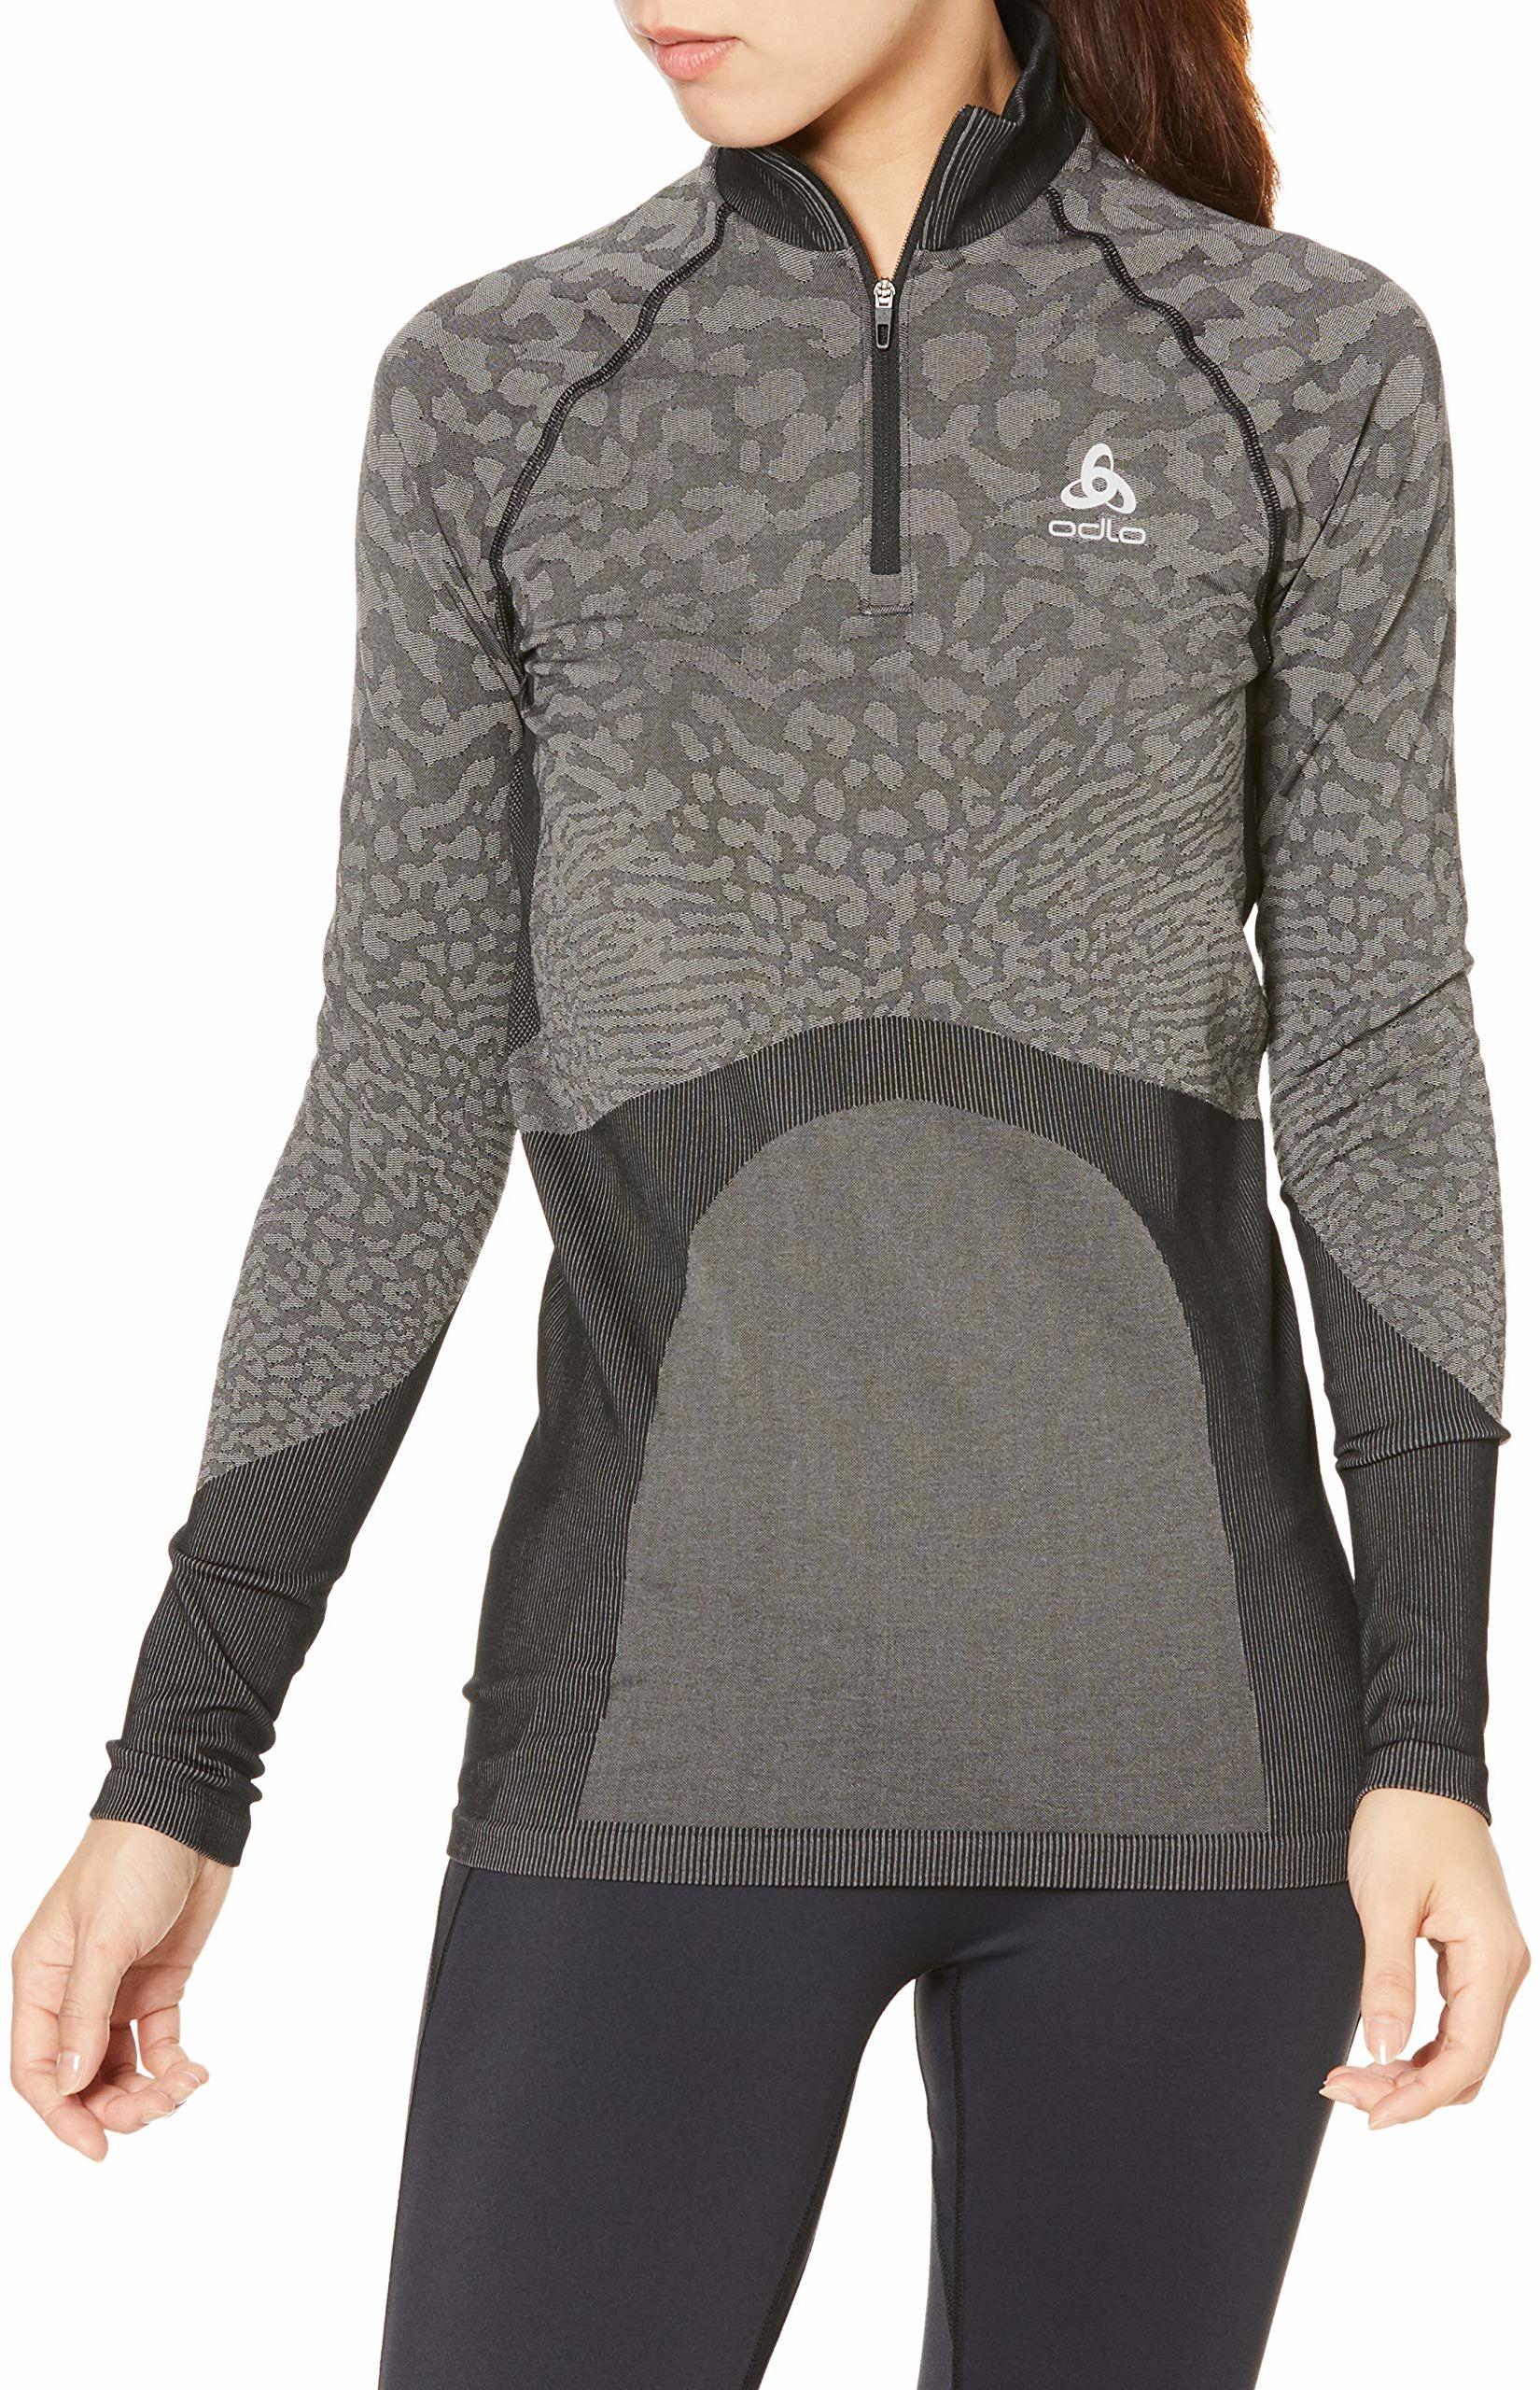 Odlo damska koszulka z długim rękawem BL Turtle Neck Half Zip Blackcomb z długim rękawem czarna, szara koszulka, XL